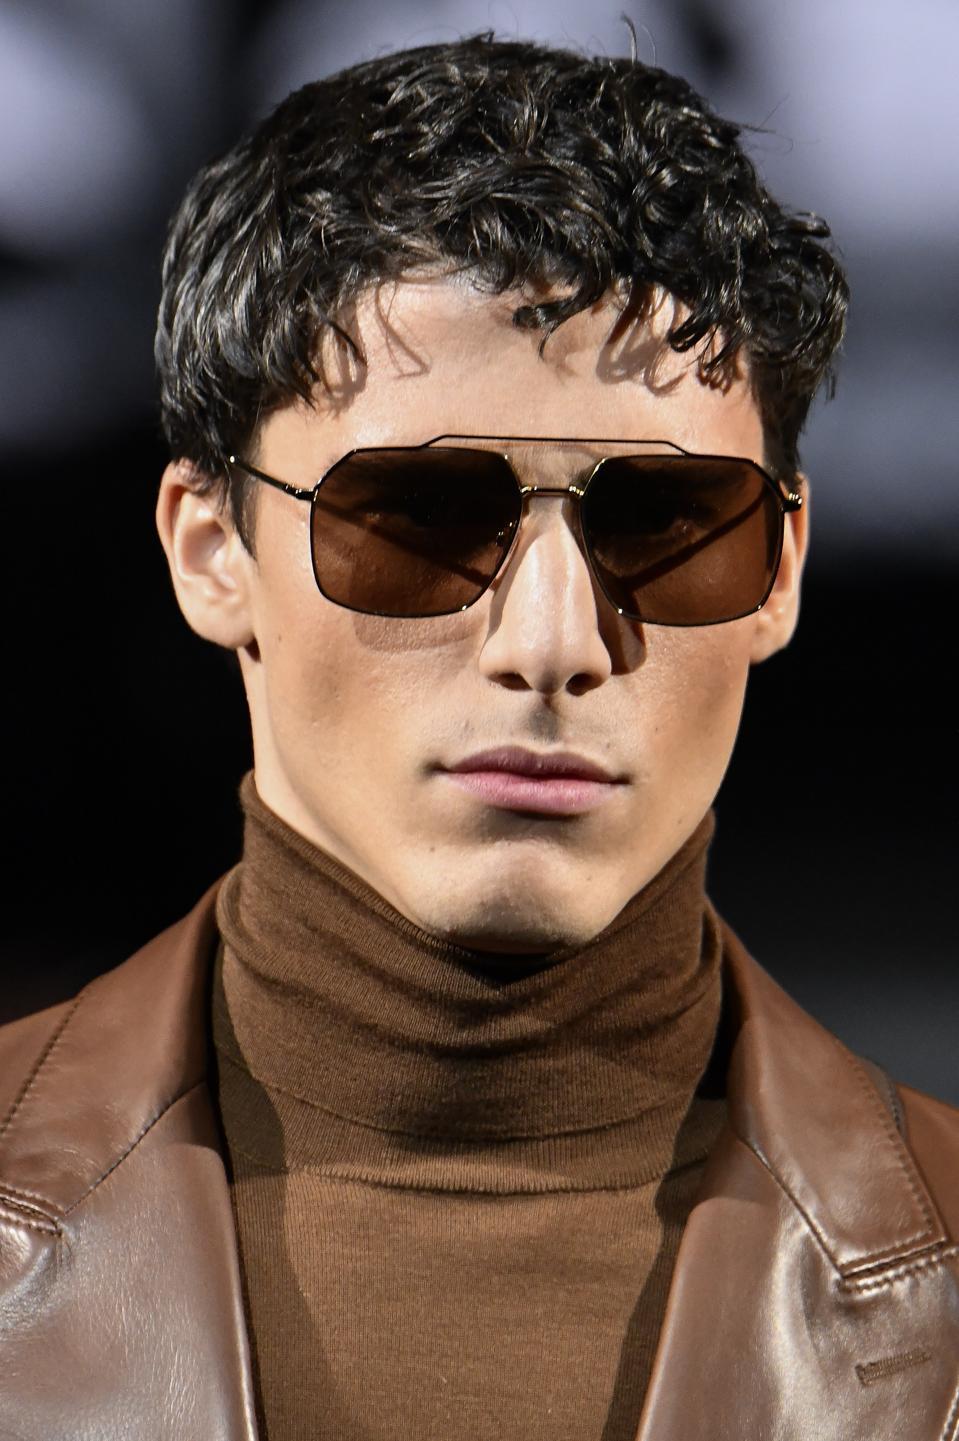 Dolce & Gabbana - Runway - Milan Men's Fashion Week Fall/Winter 2020/2021